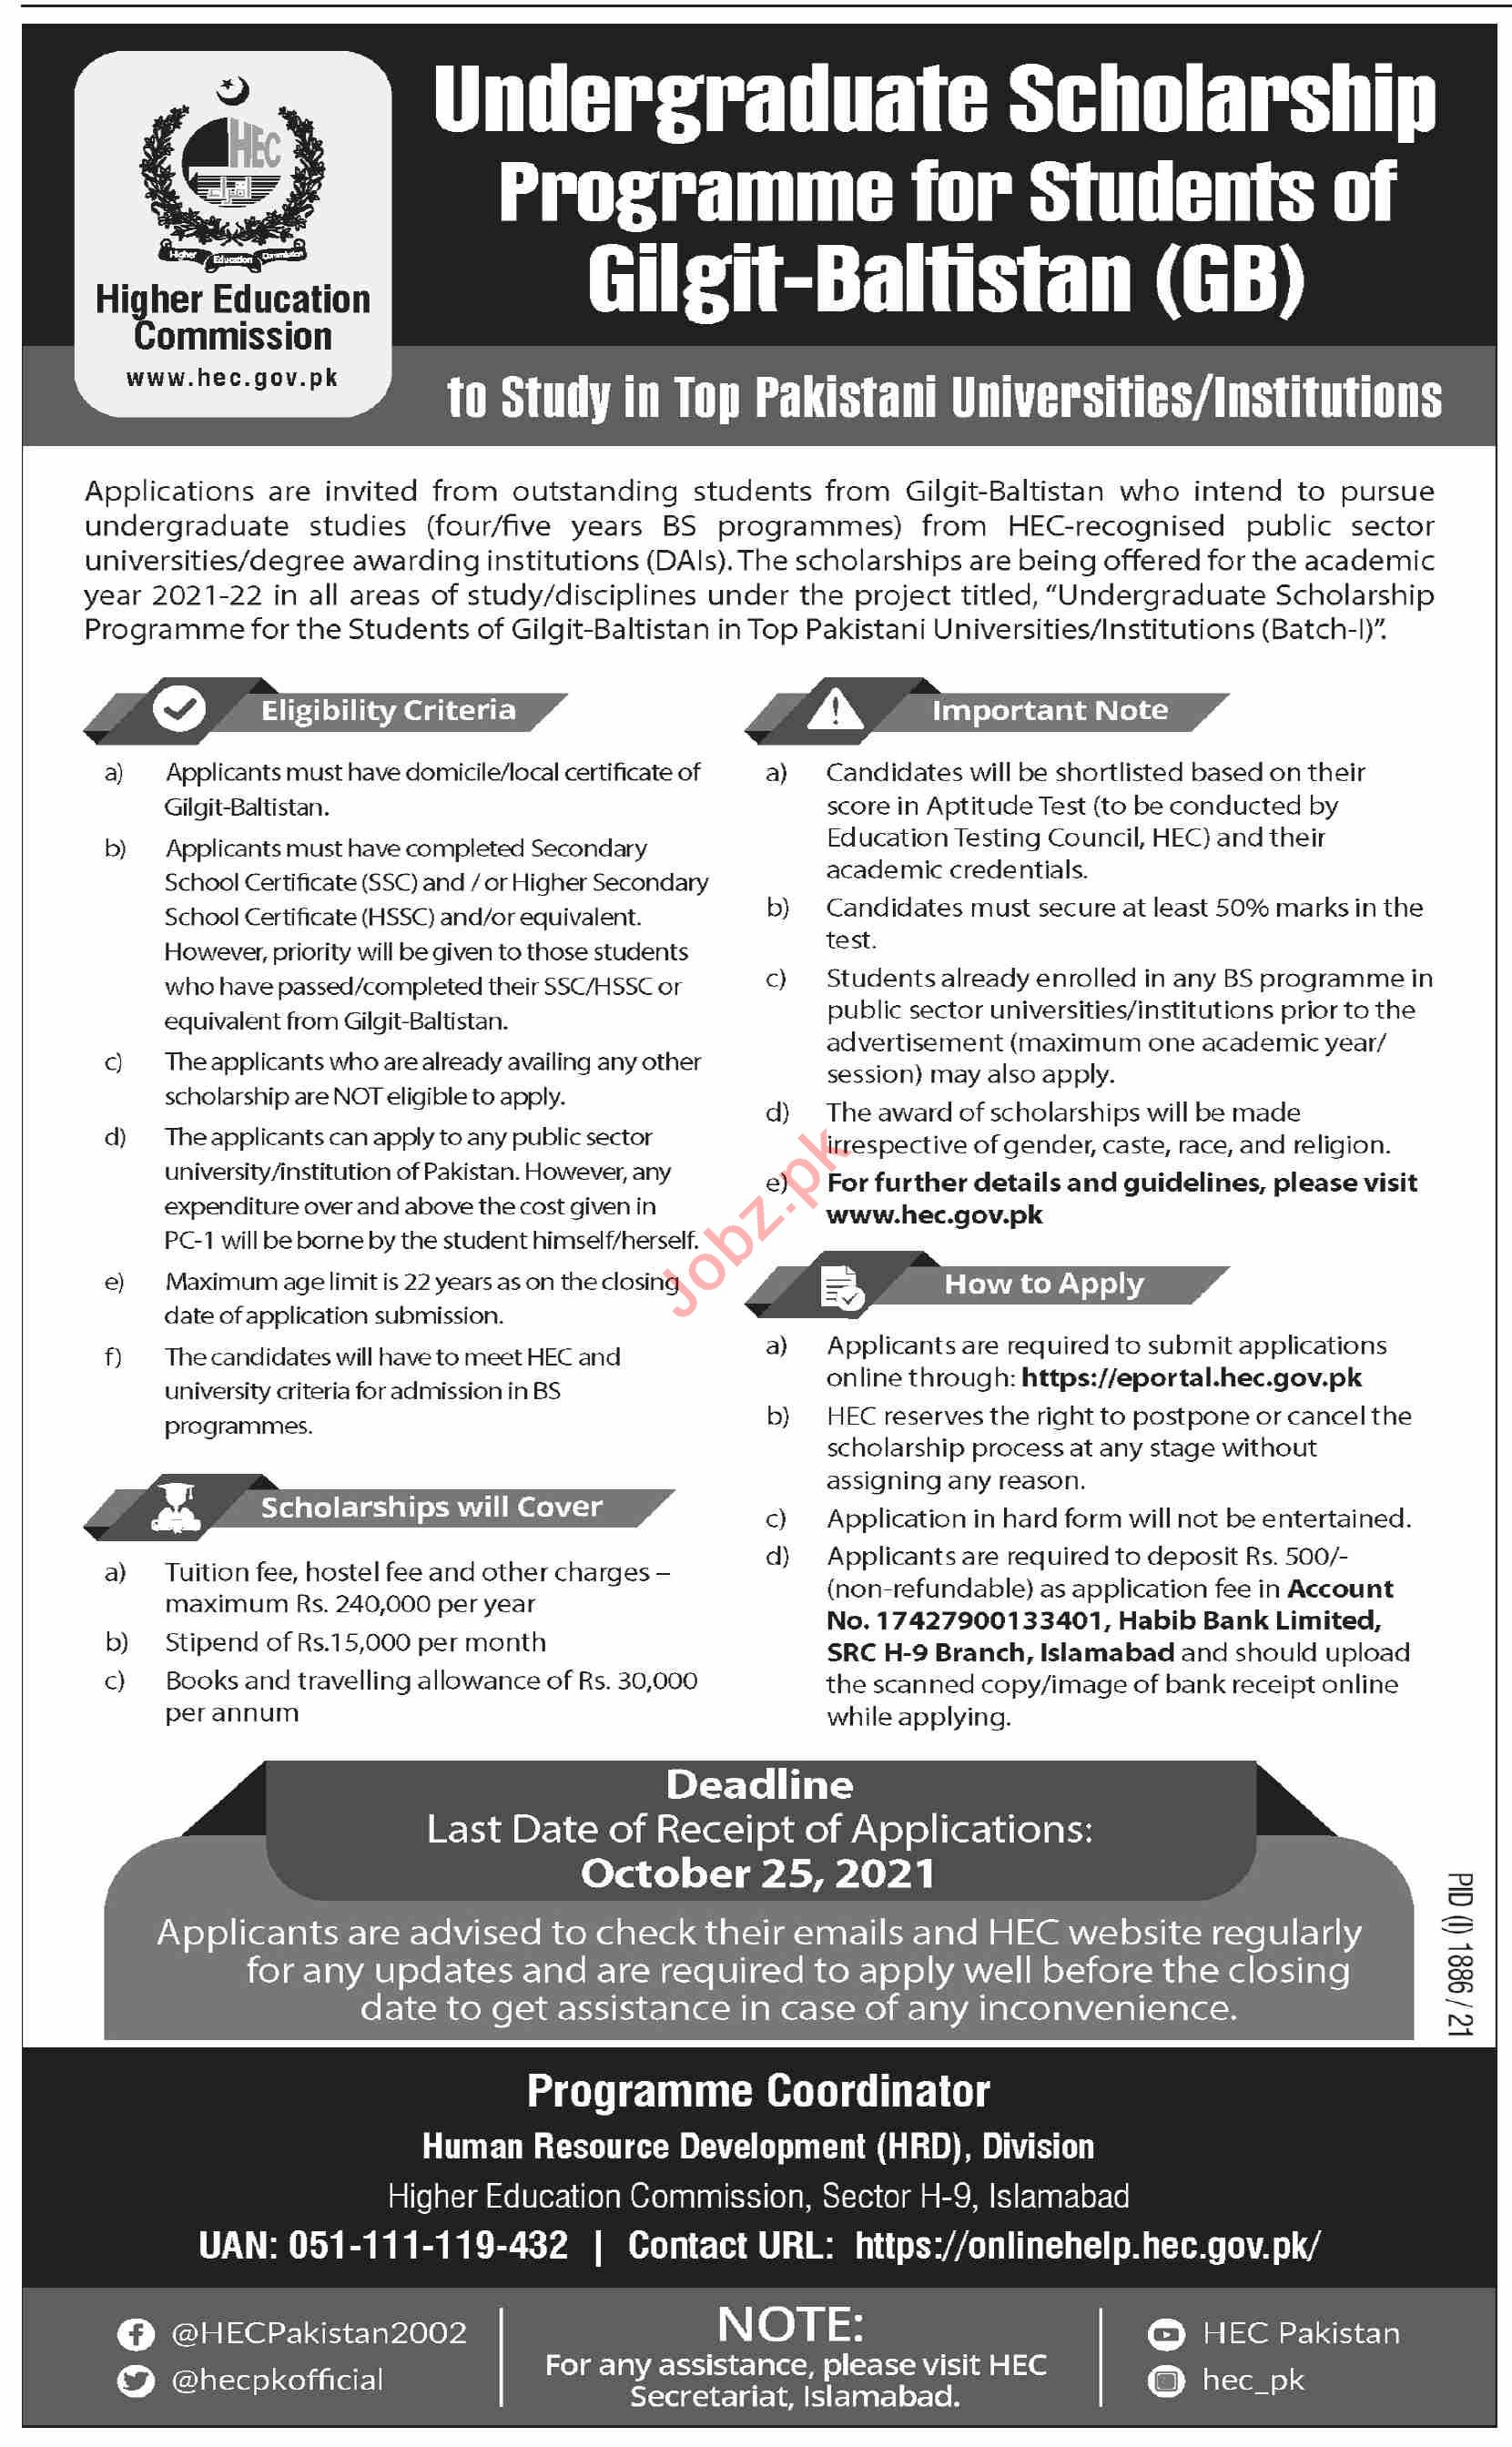 HEC Undergraduate Scholarship Programme for Gilgit Baltistan